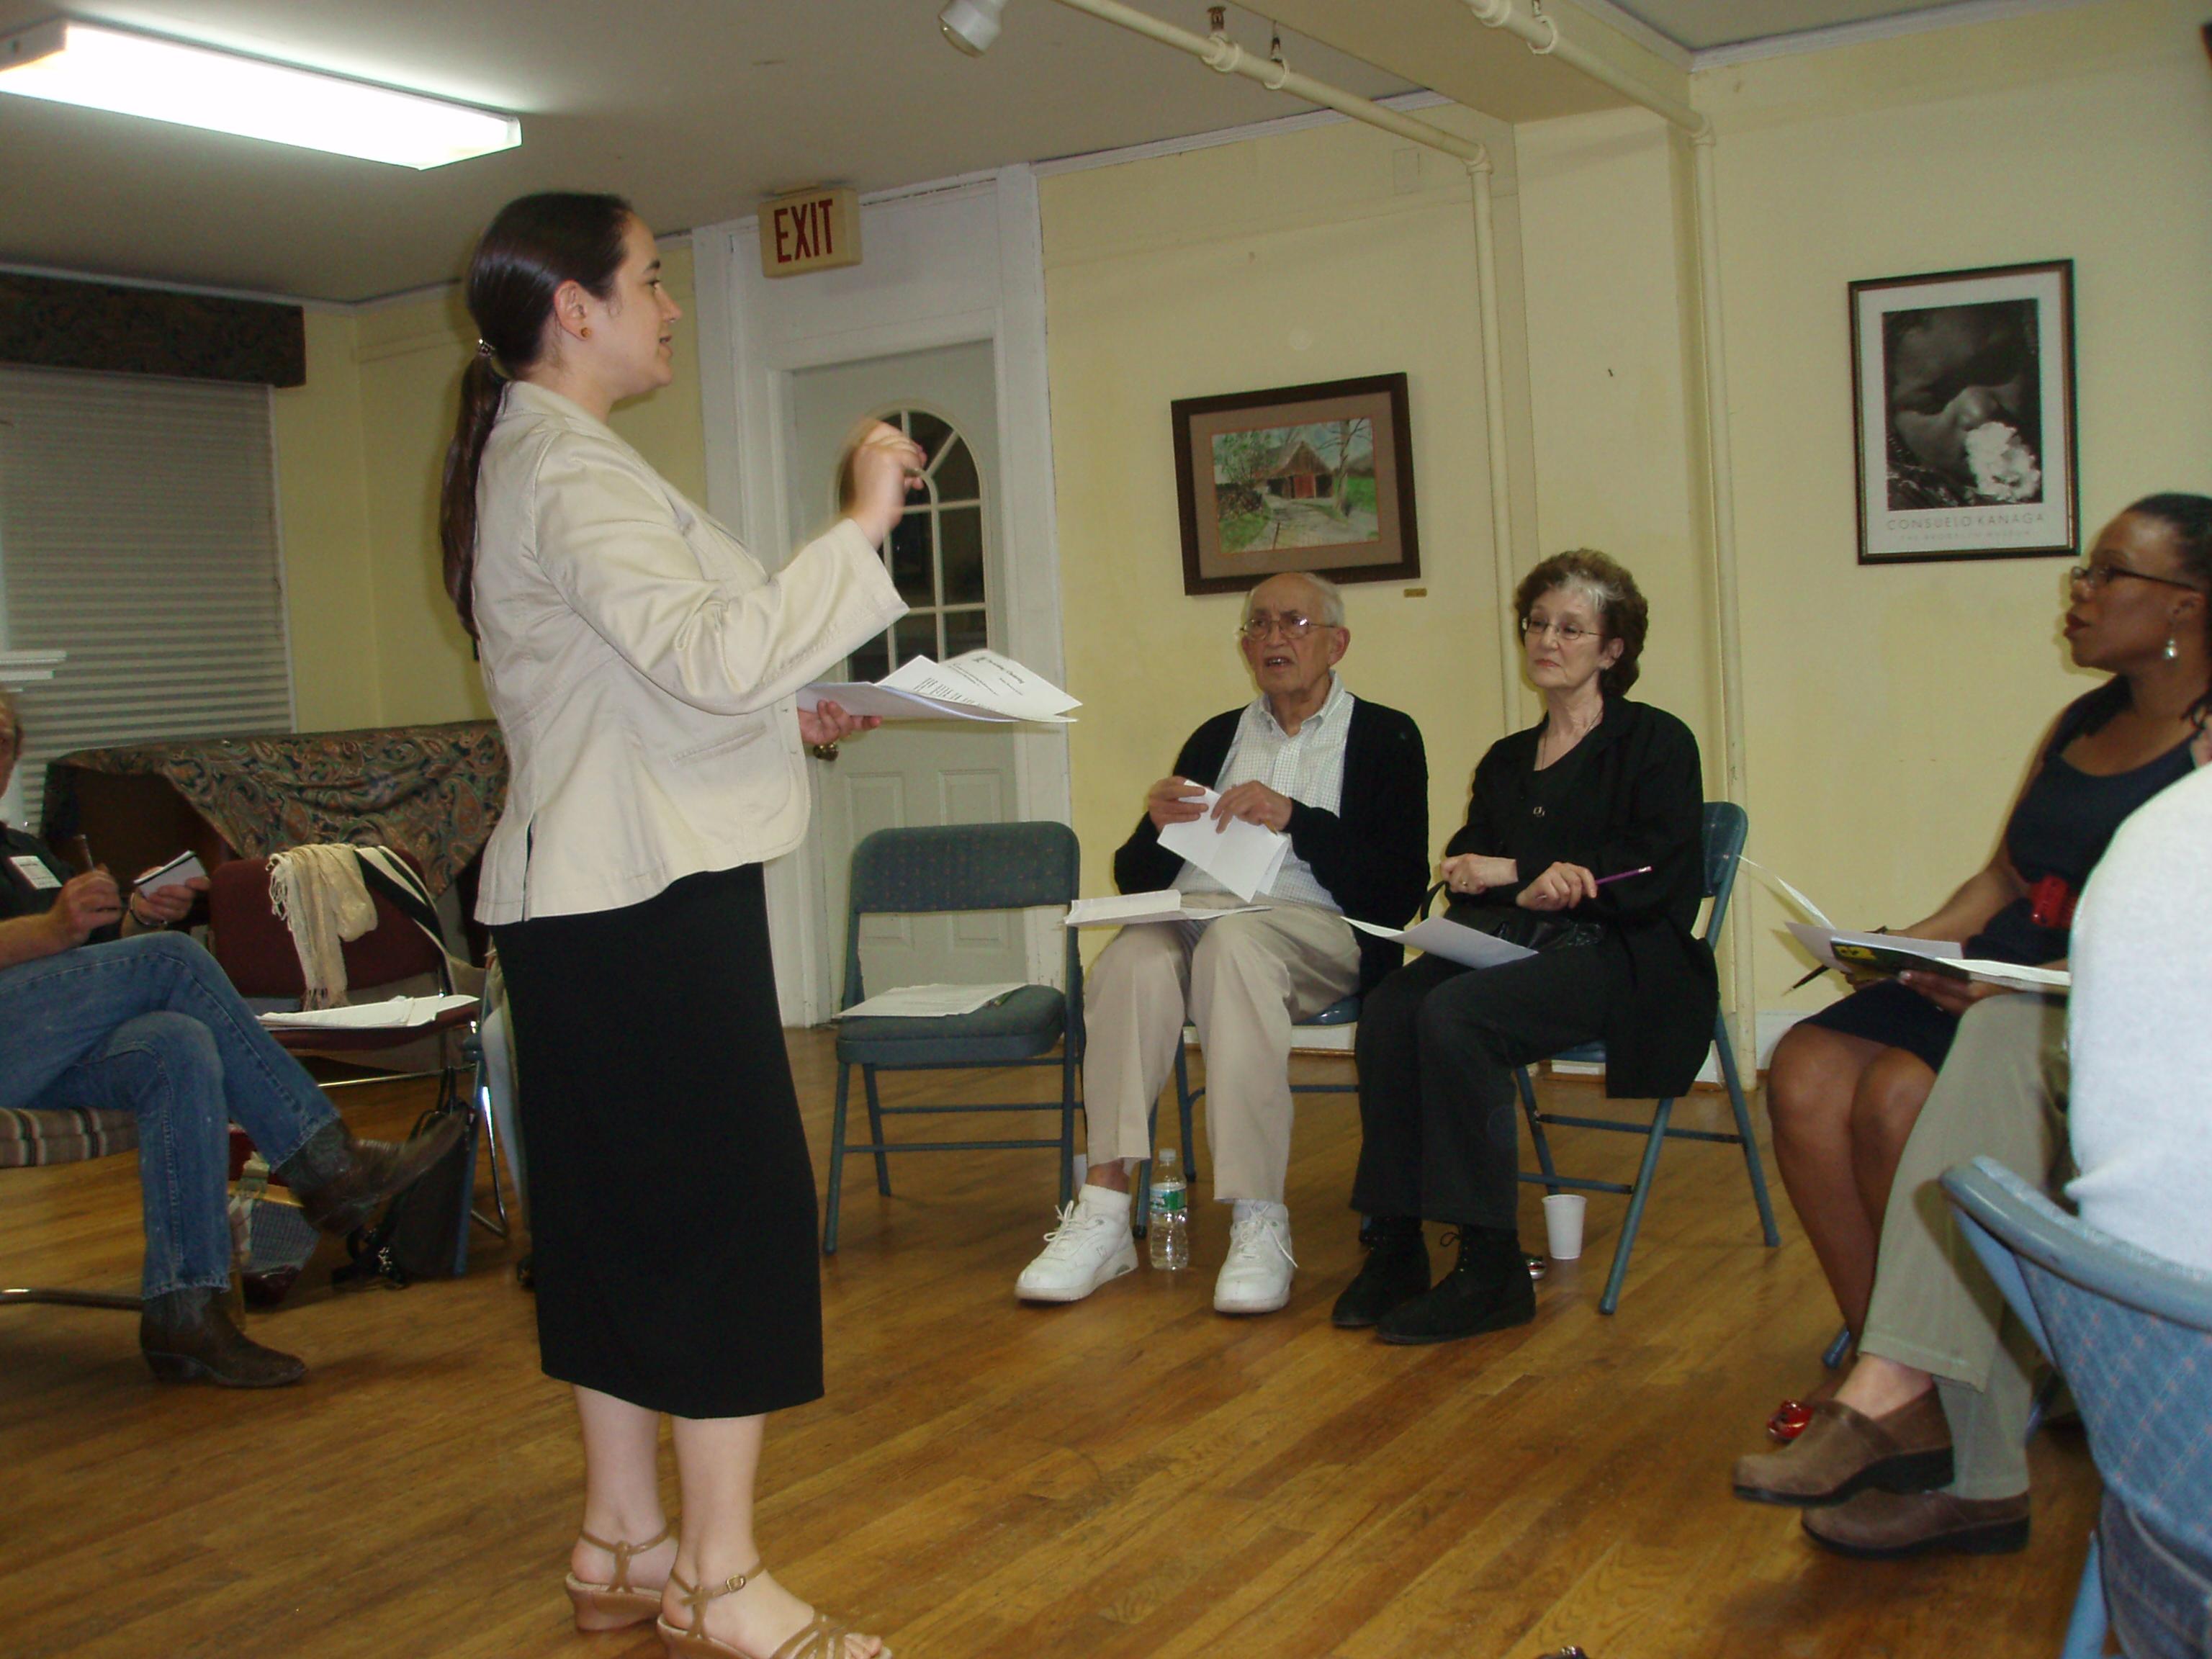 Giving a similar talk in Maplewood, NJ (summer 09)